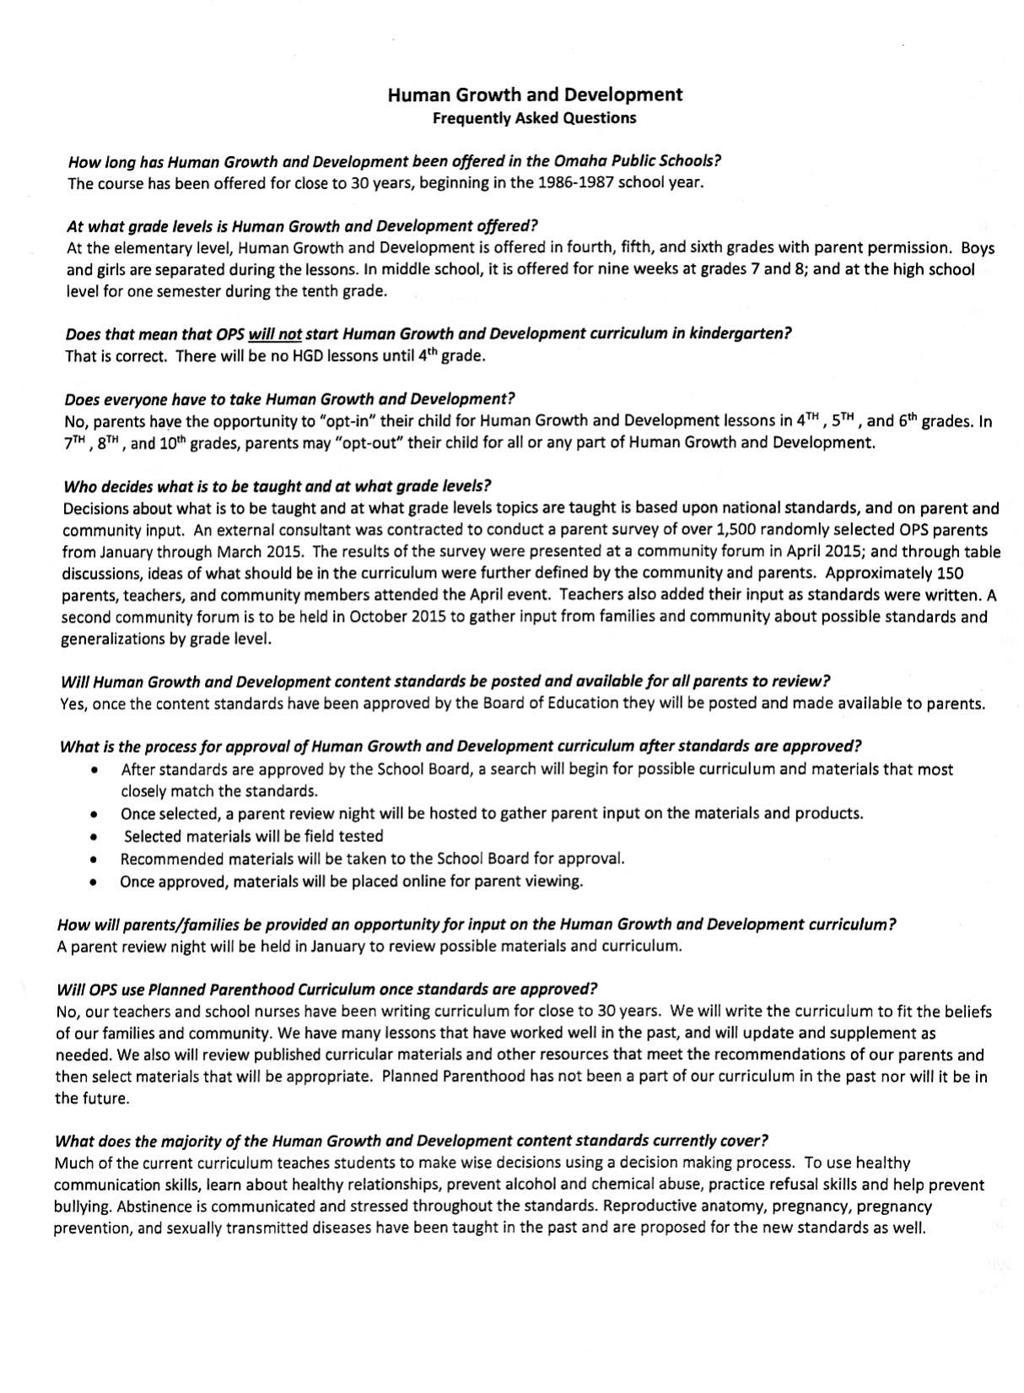 OPS board undeterred in effort to update sex education